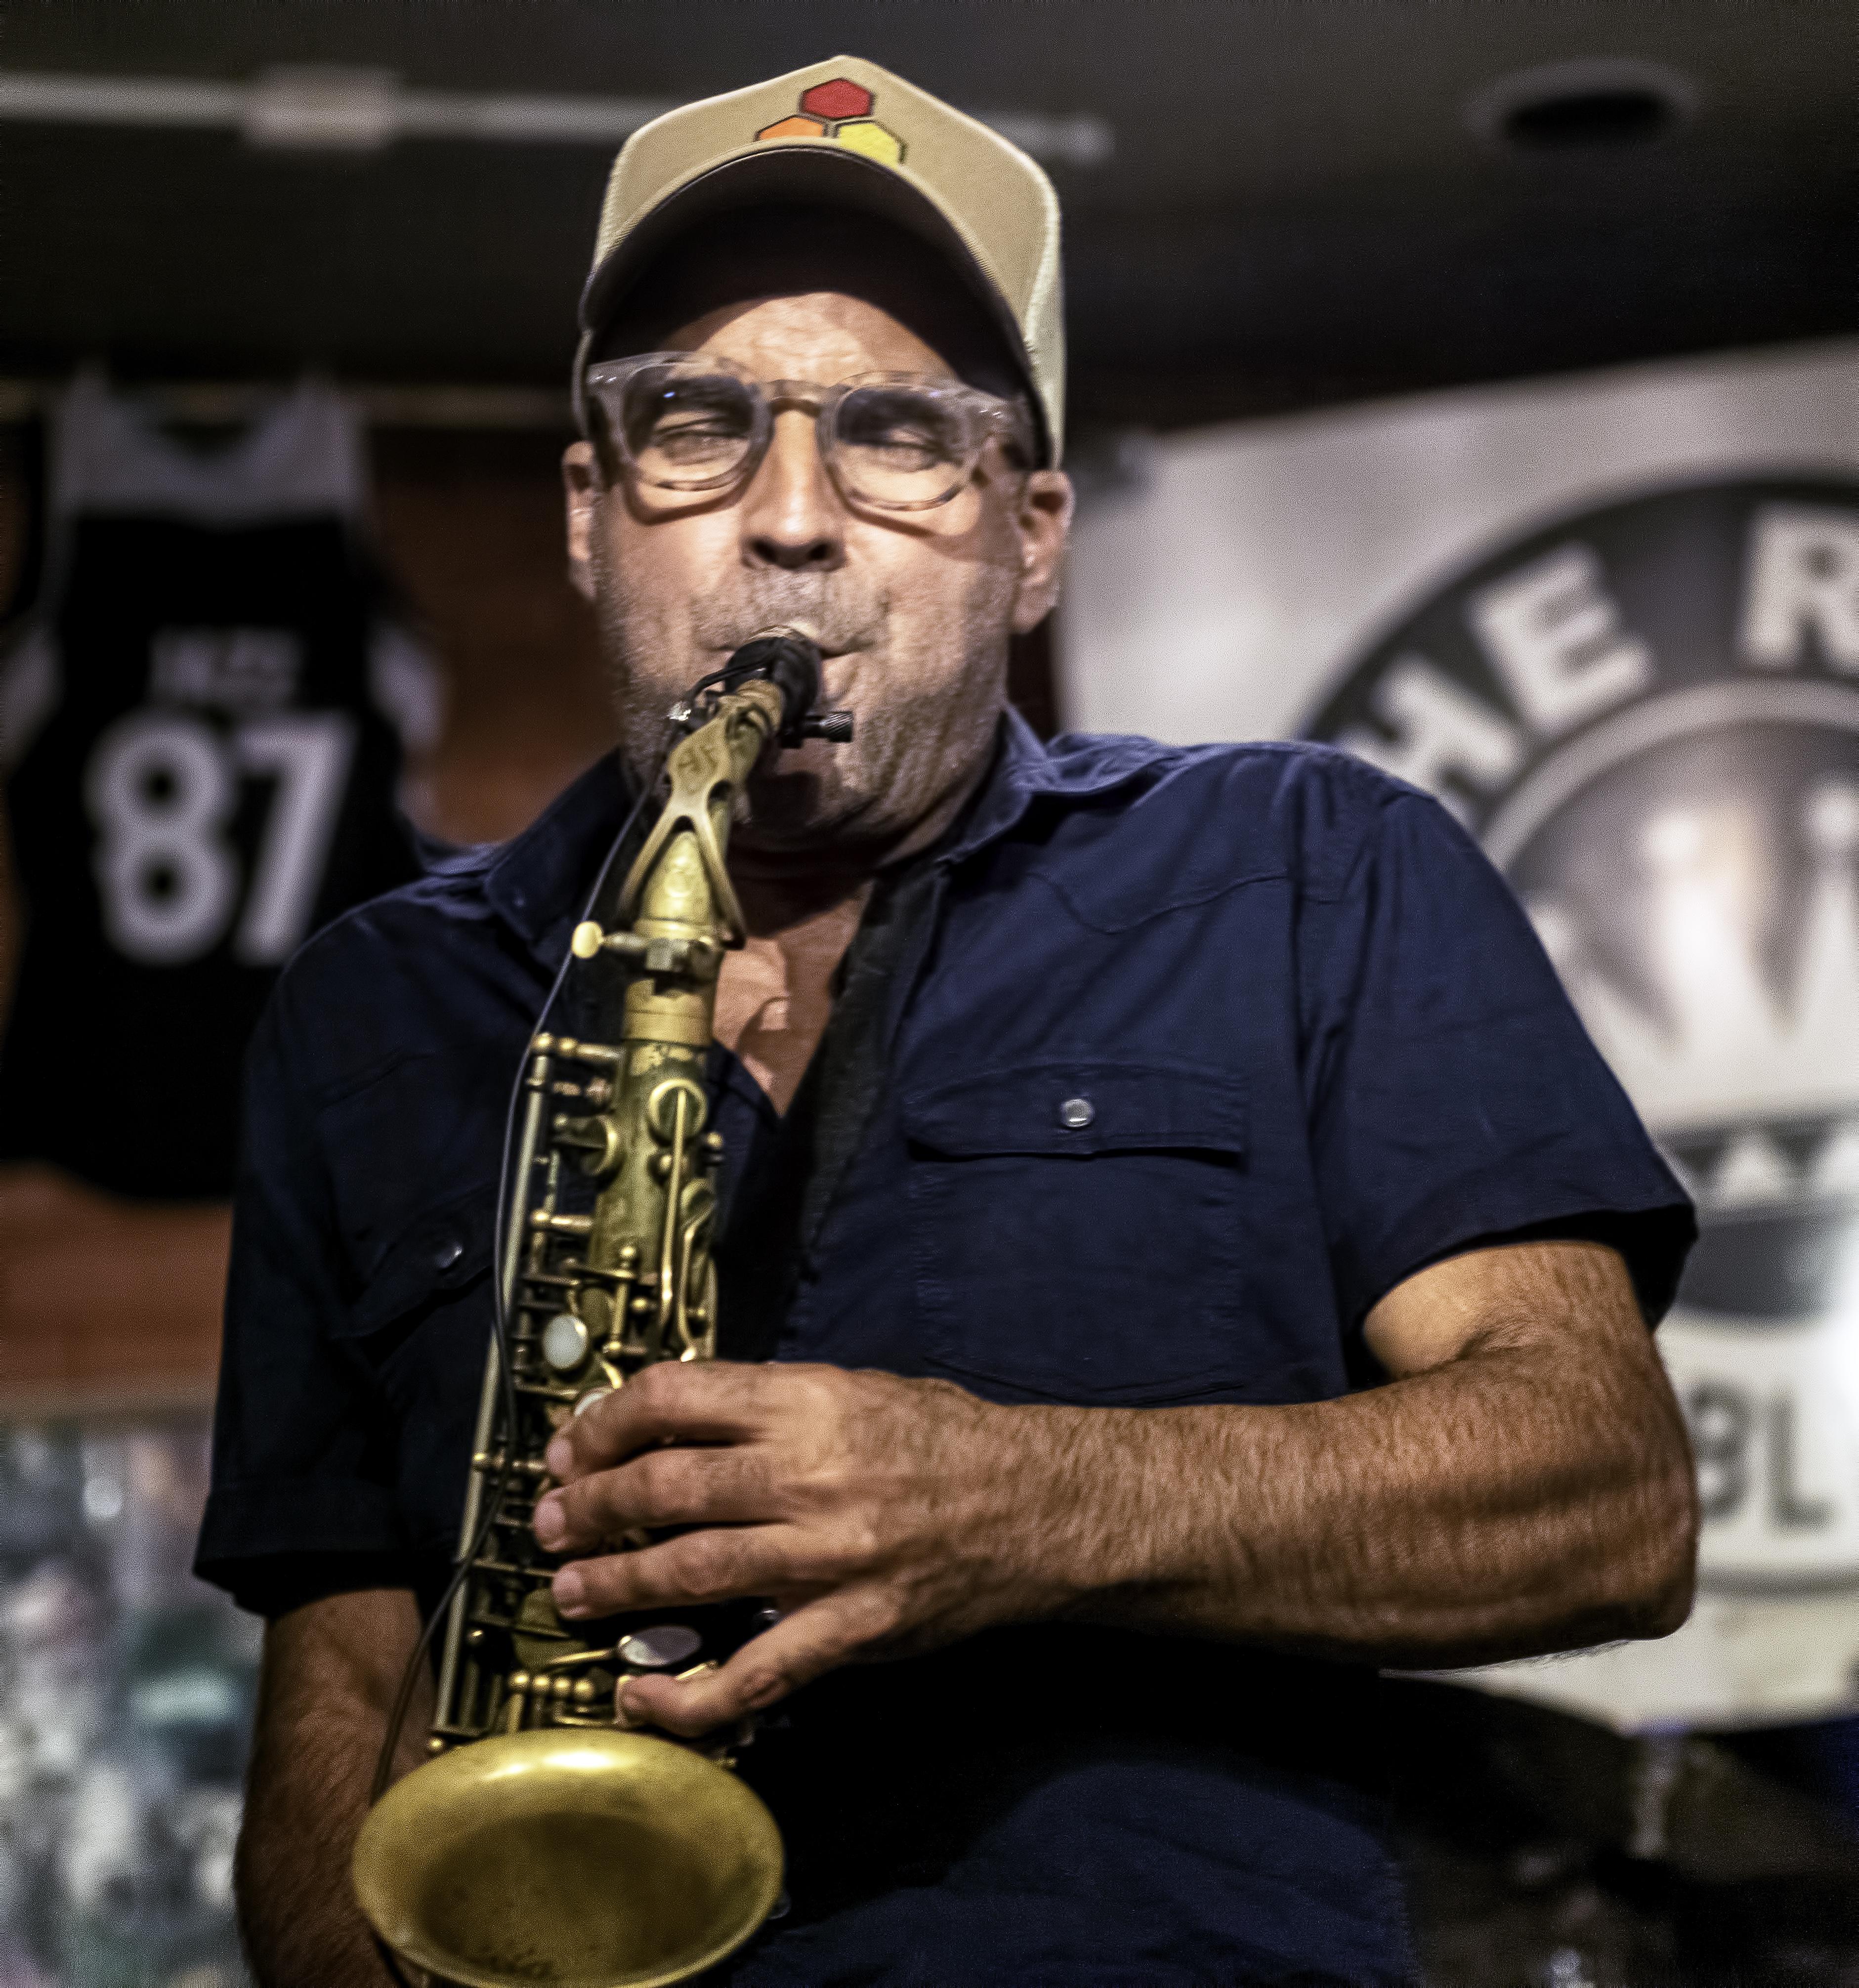 David Binney at the Rex Jazz Bar at the Toronto Jazz Festival 2019